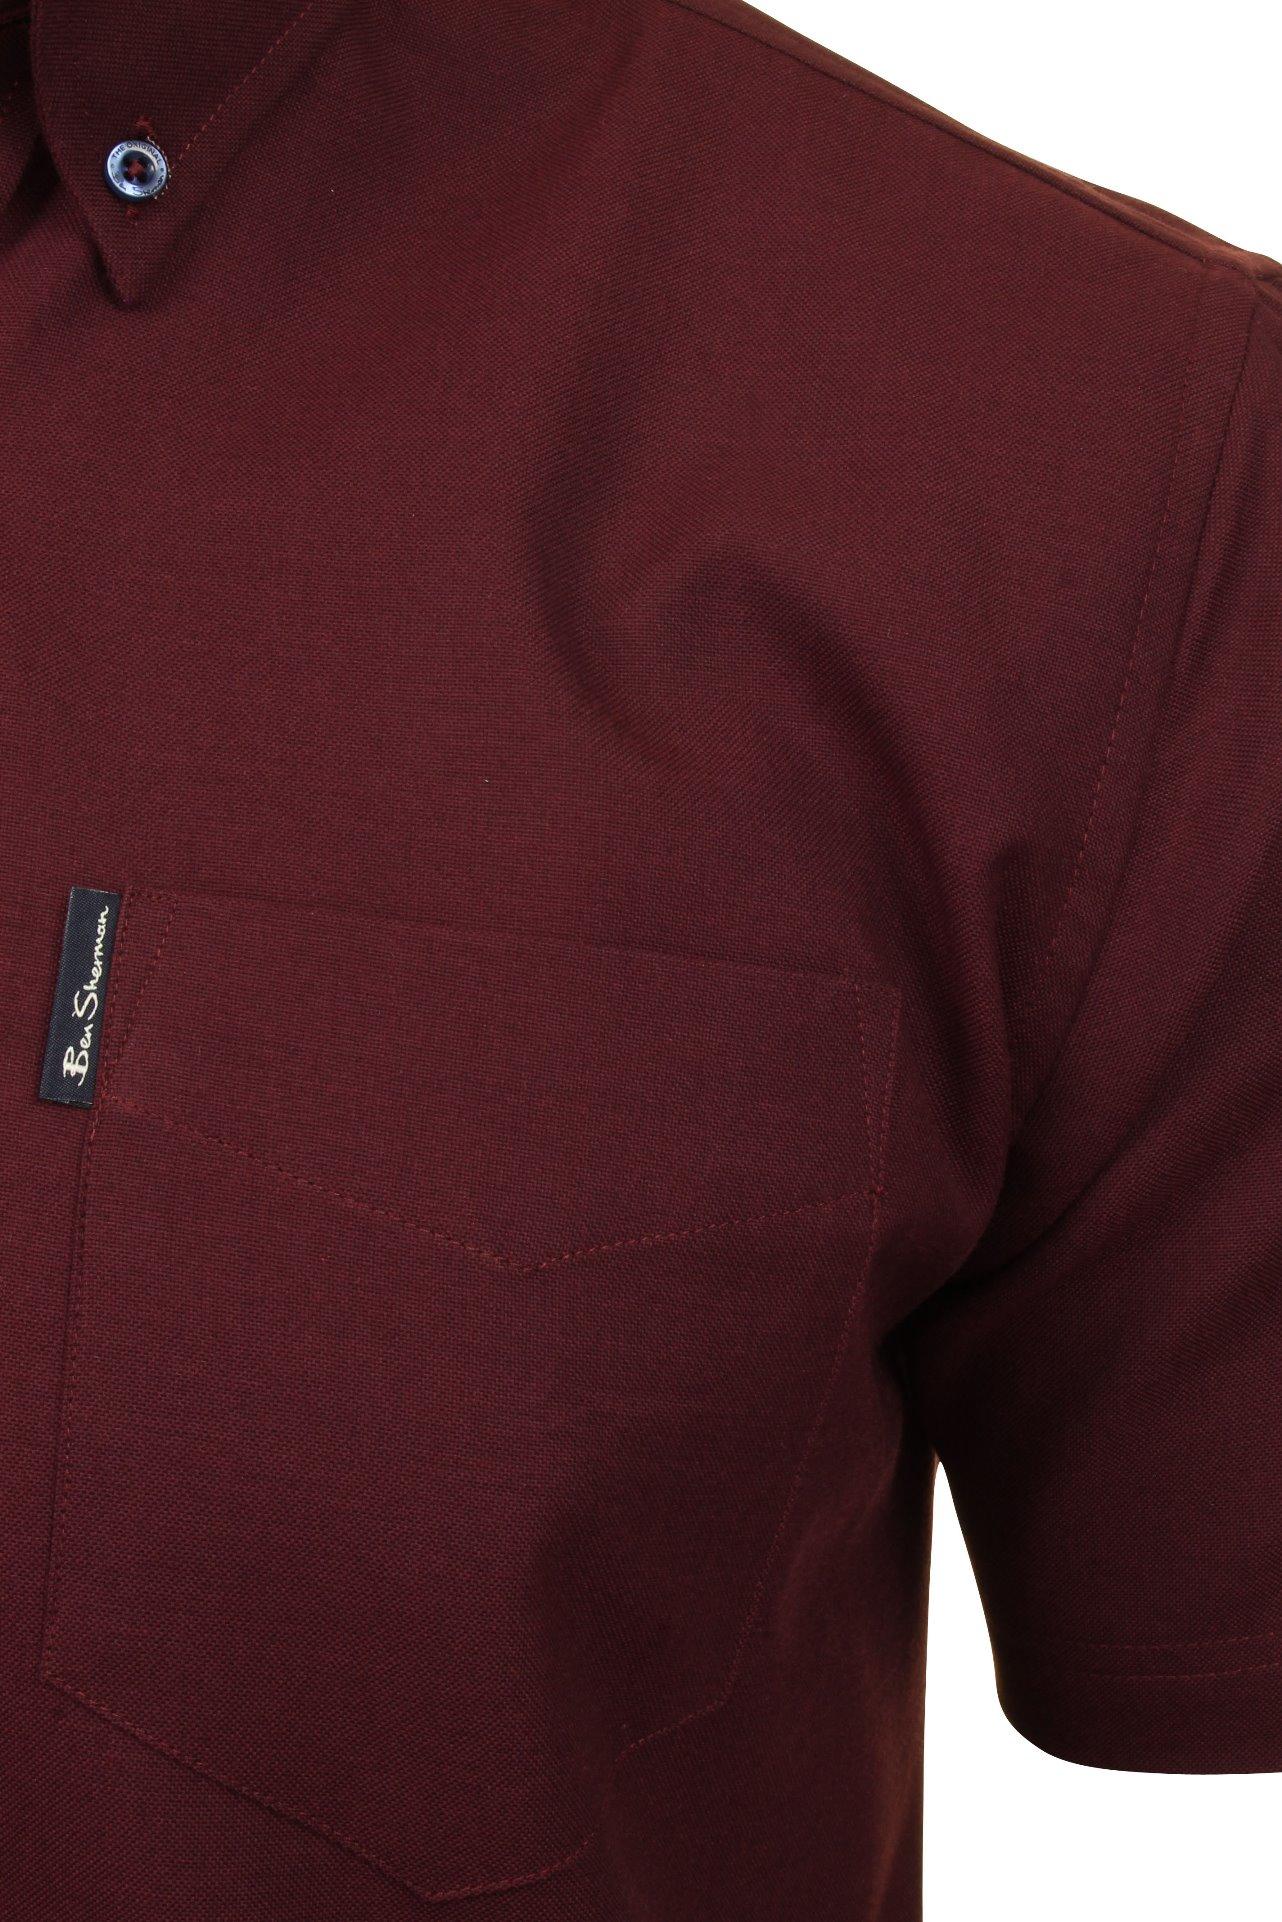 Ben-Sherman-Mens-Oxford-Shirt-Short-Sleeve thumbnail 11